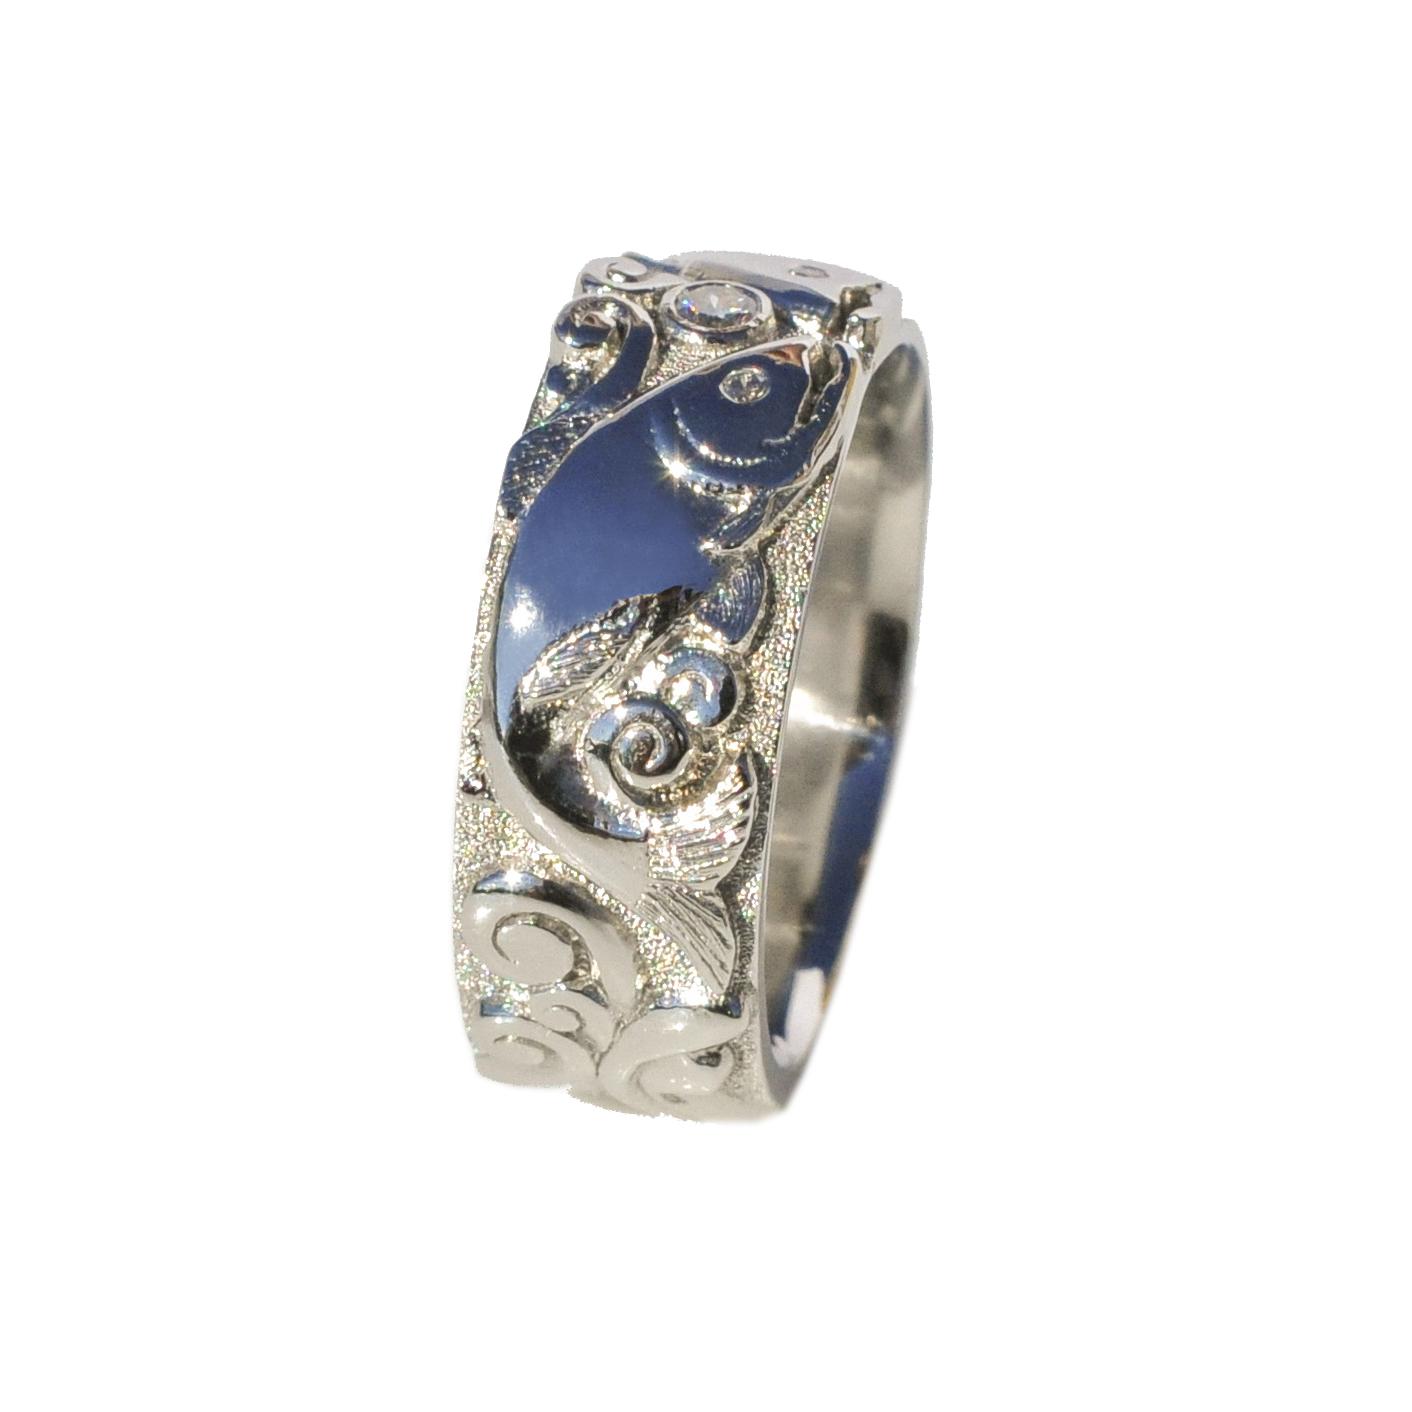 Waylon Rhoads Original Platinum Salmon Ring with Diamonds